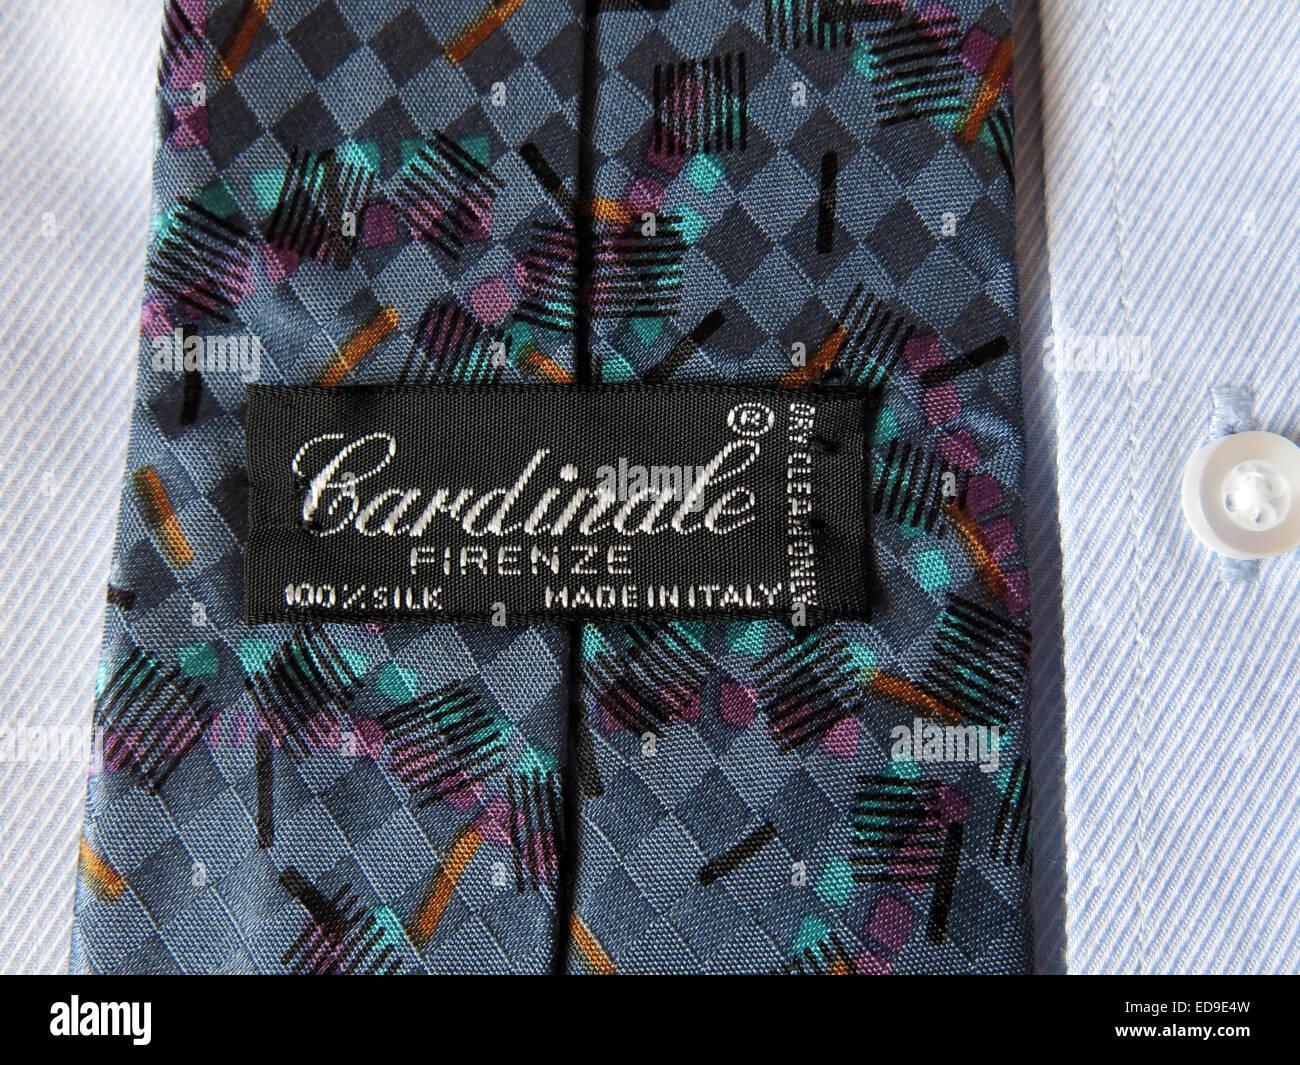 Laden Sie dieses Alamy Stockfoto Interessante Oldtimer Cardinale Firenze Krawatte, männliche Antik in Seide - ED9E4W